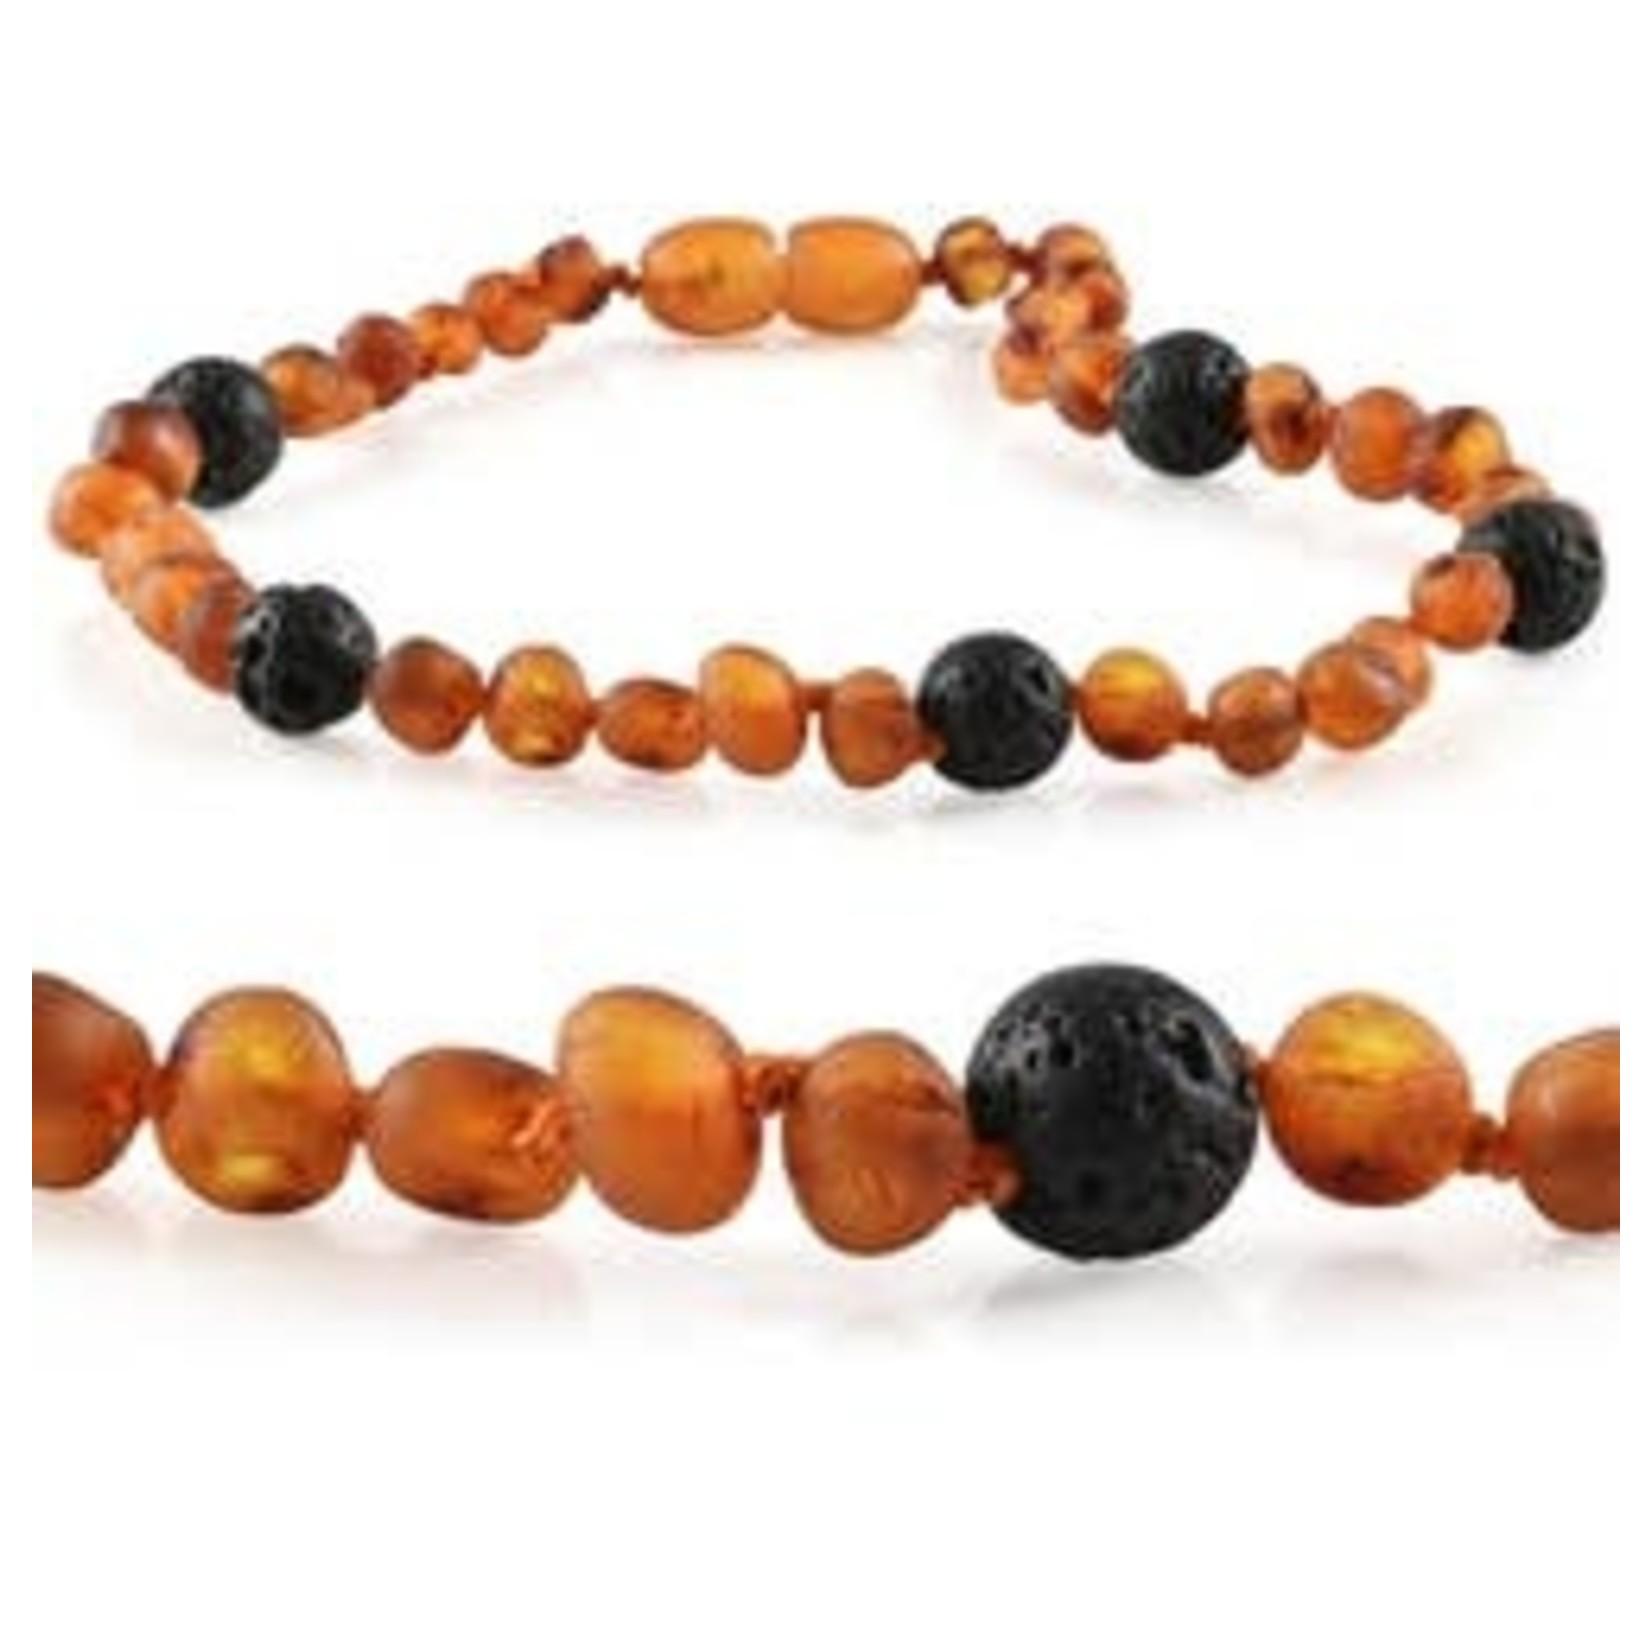 R.B. Amber Jewelry Kids | Baltic Amber Aromatherapy Necklaces Raw Cognac Lava